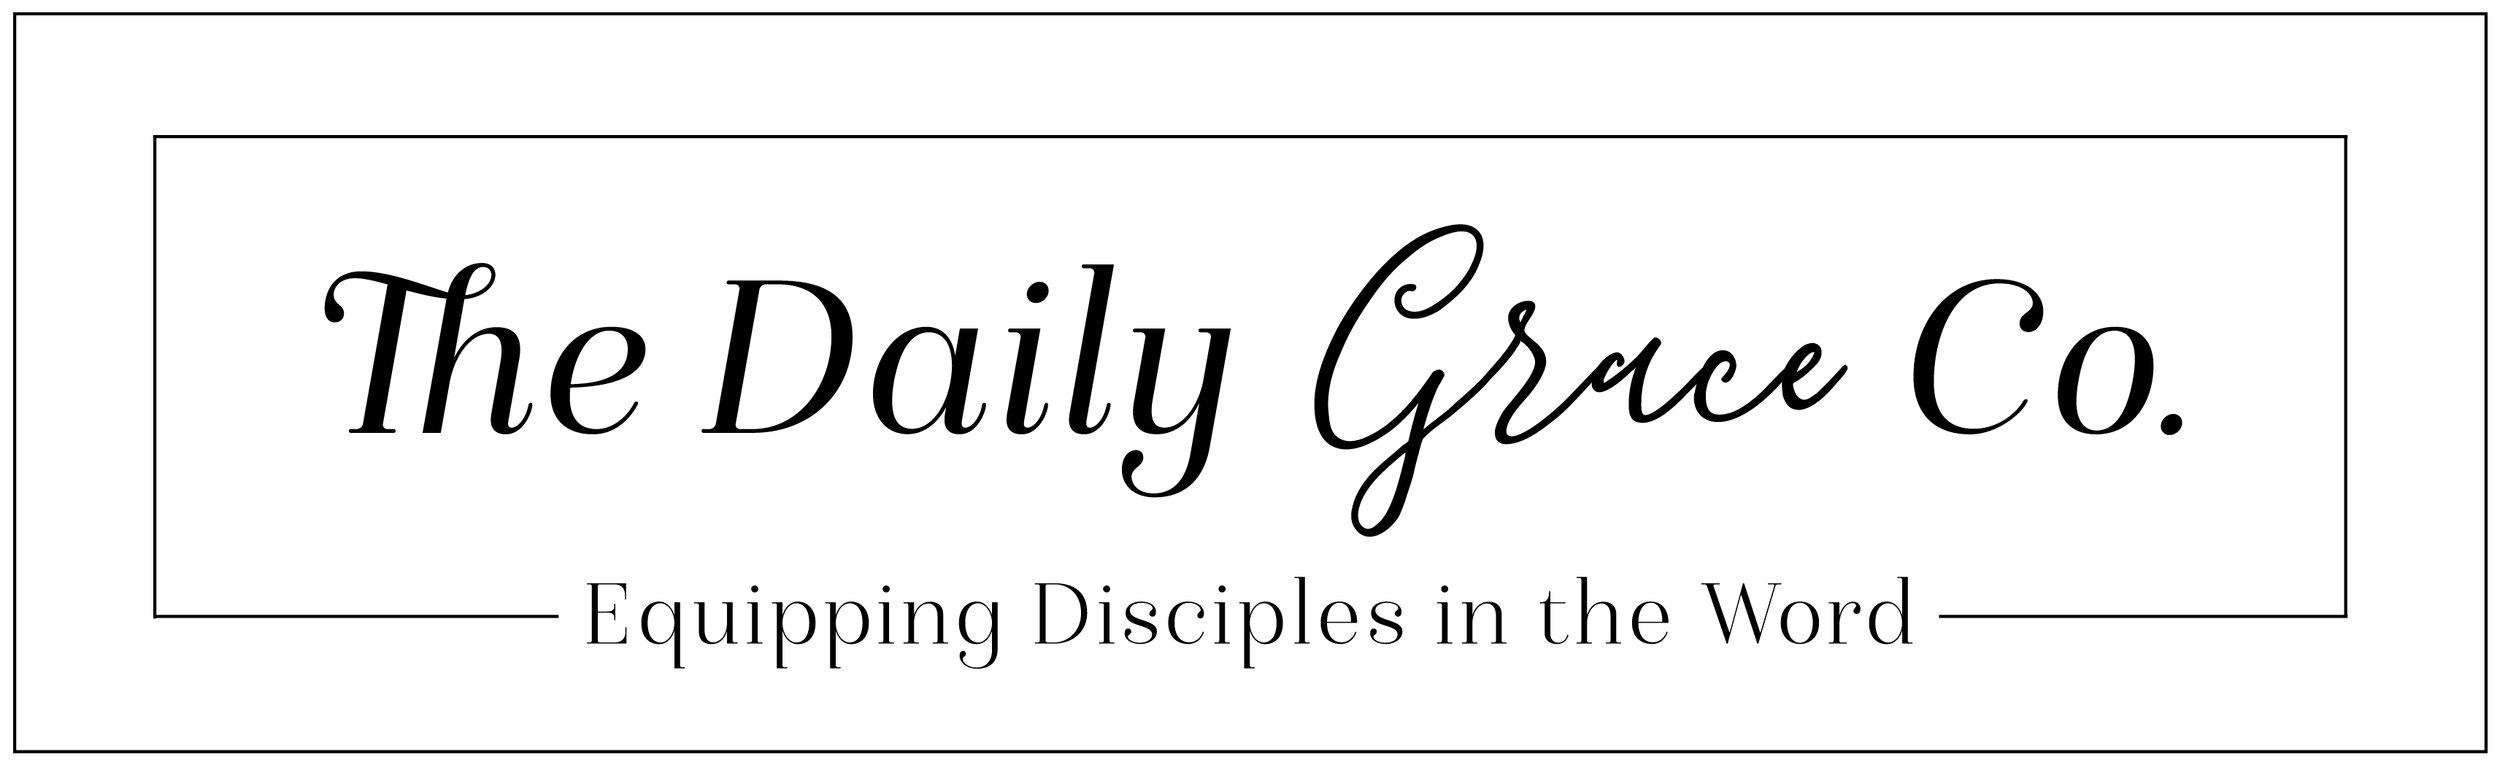 DailyGrace-Logos-update-PRINT.jpg